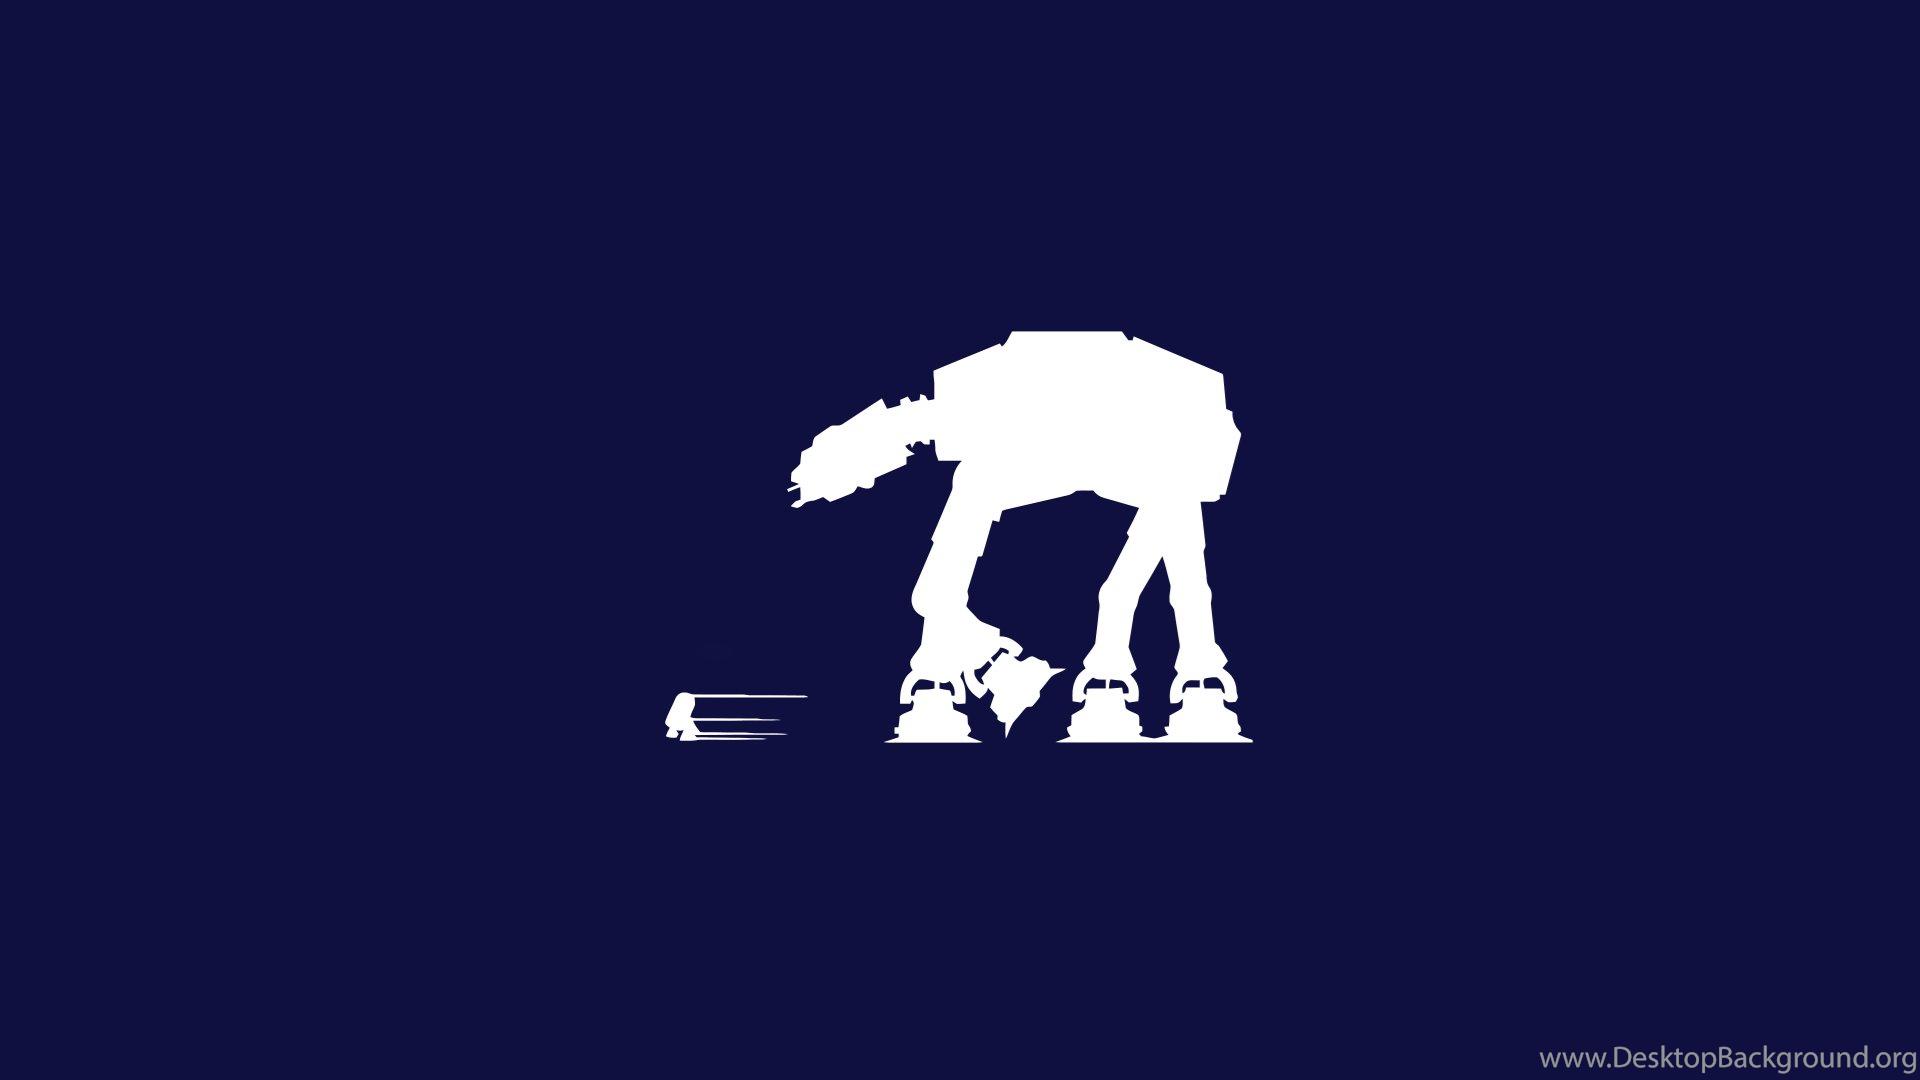 Funny Star Wars Wallpapers Desktop Background